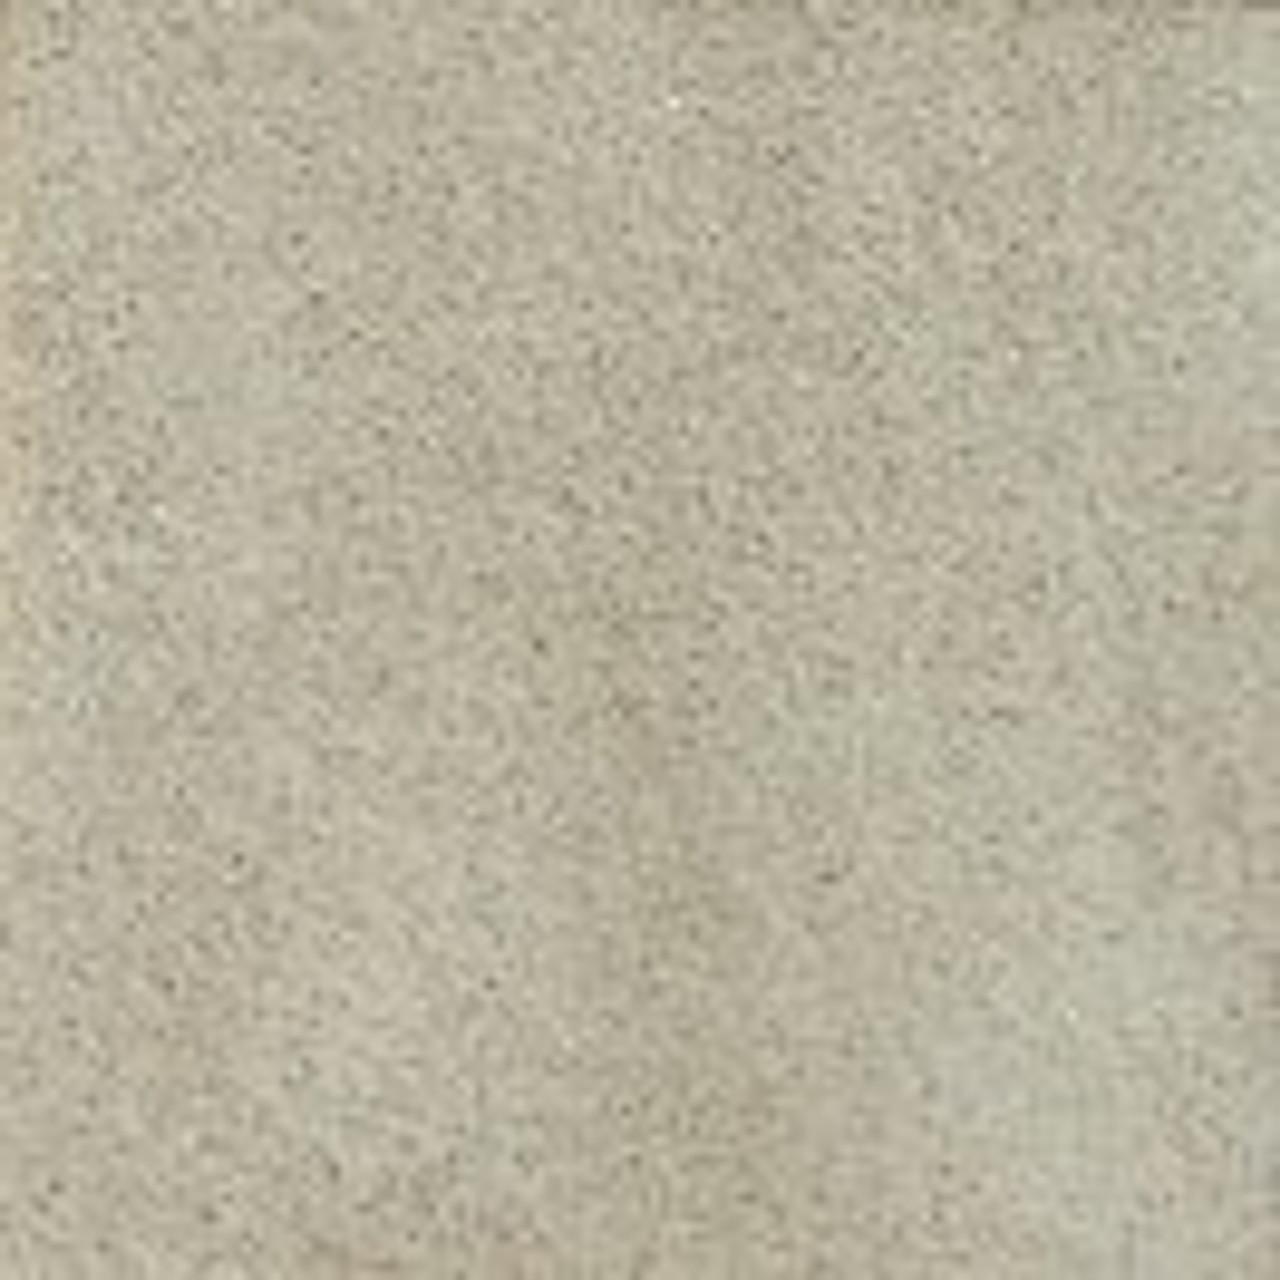 Birmingham Buff Sandstone with Sandblasted Finish